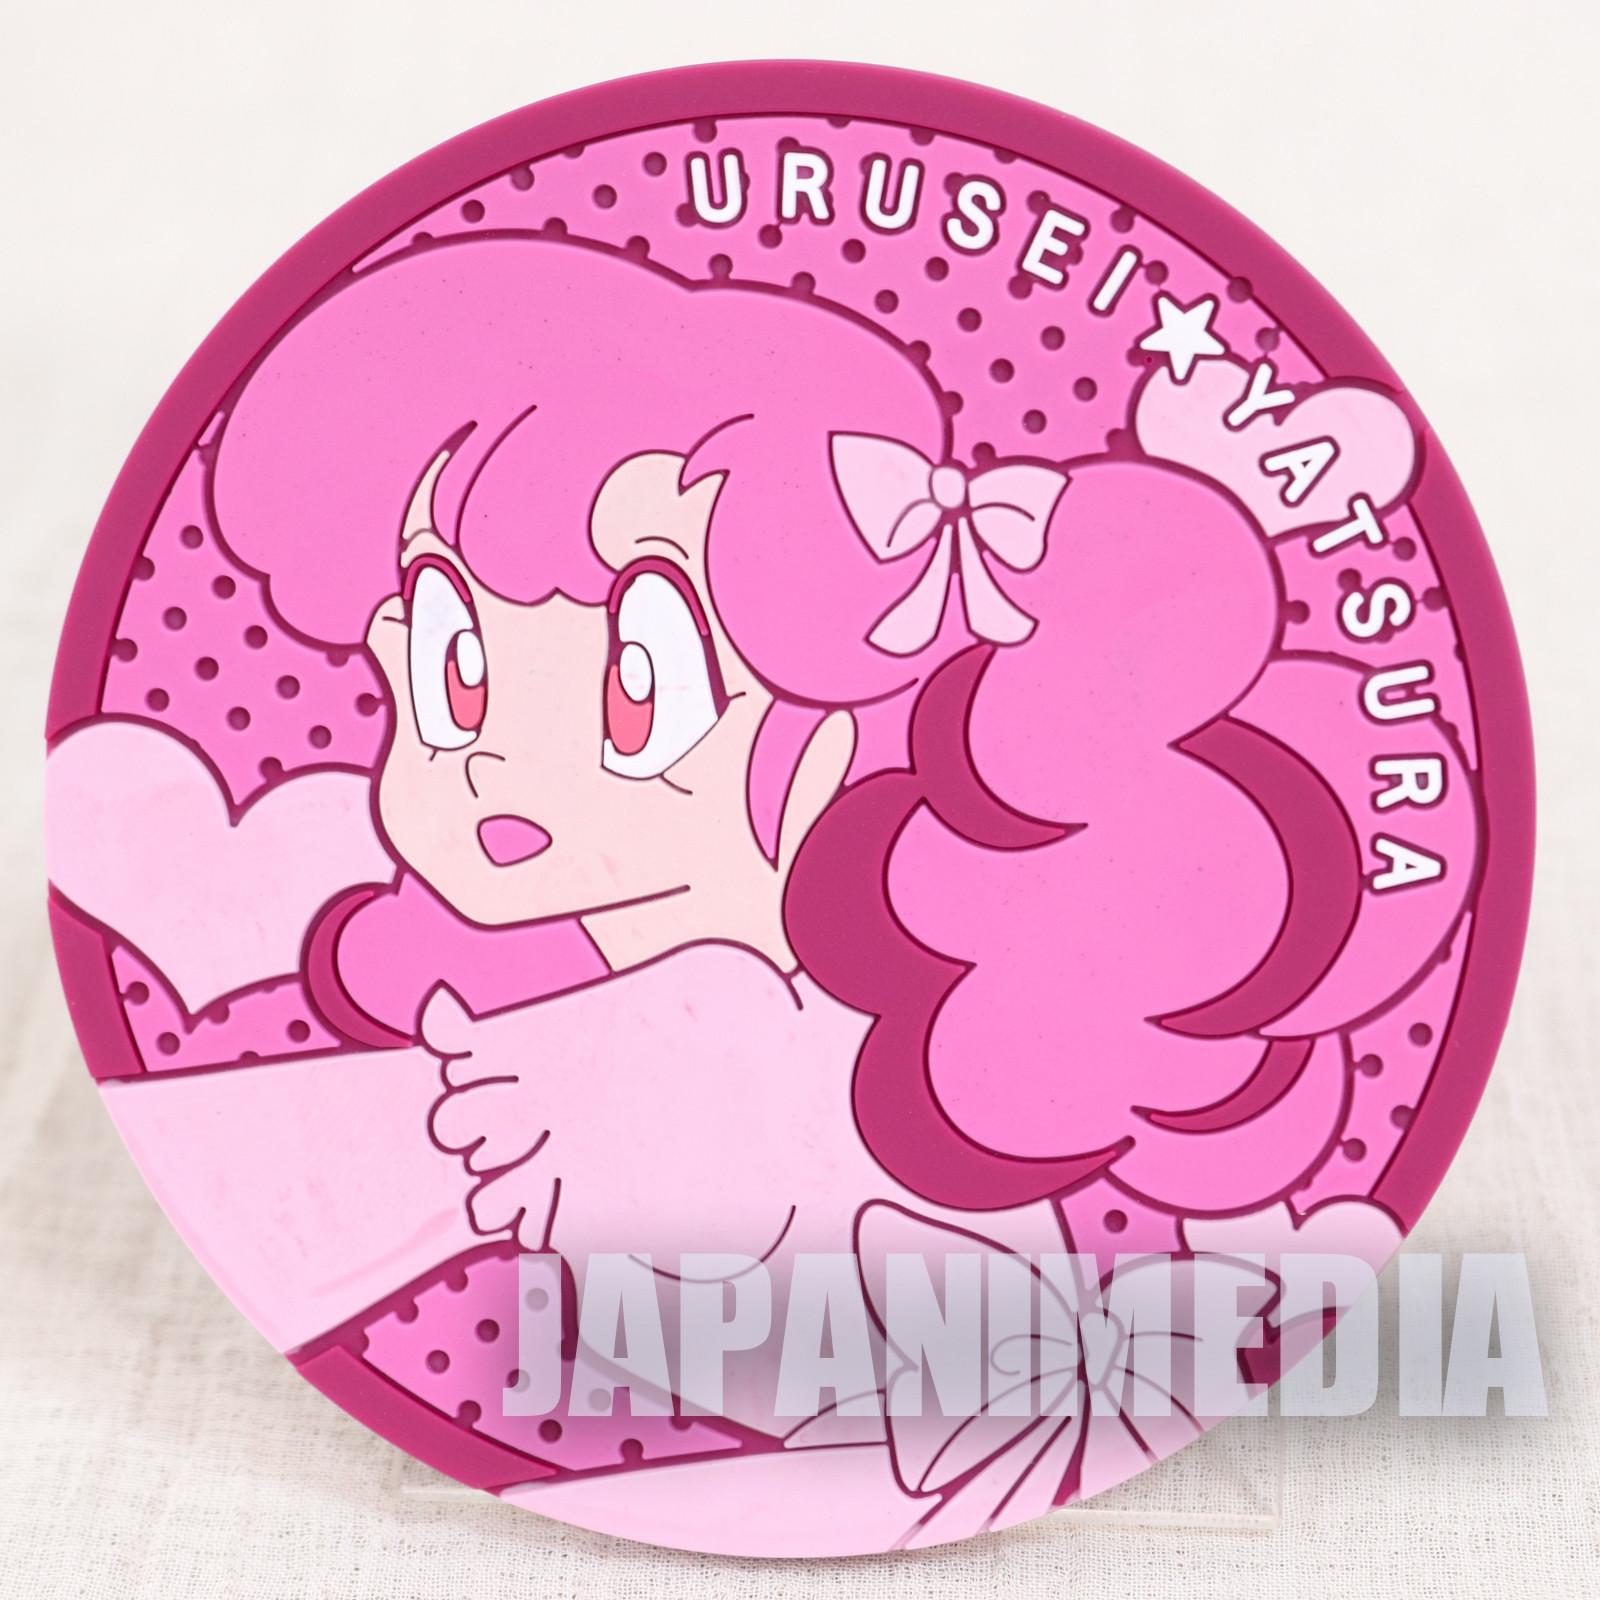 RARE!! Urusei Yatsura Rubber Coaster RAN JAPAN ANIME